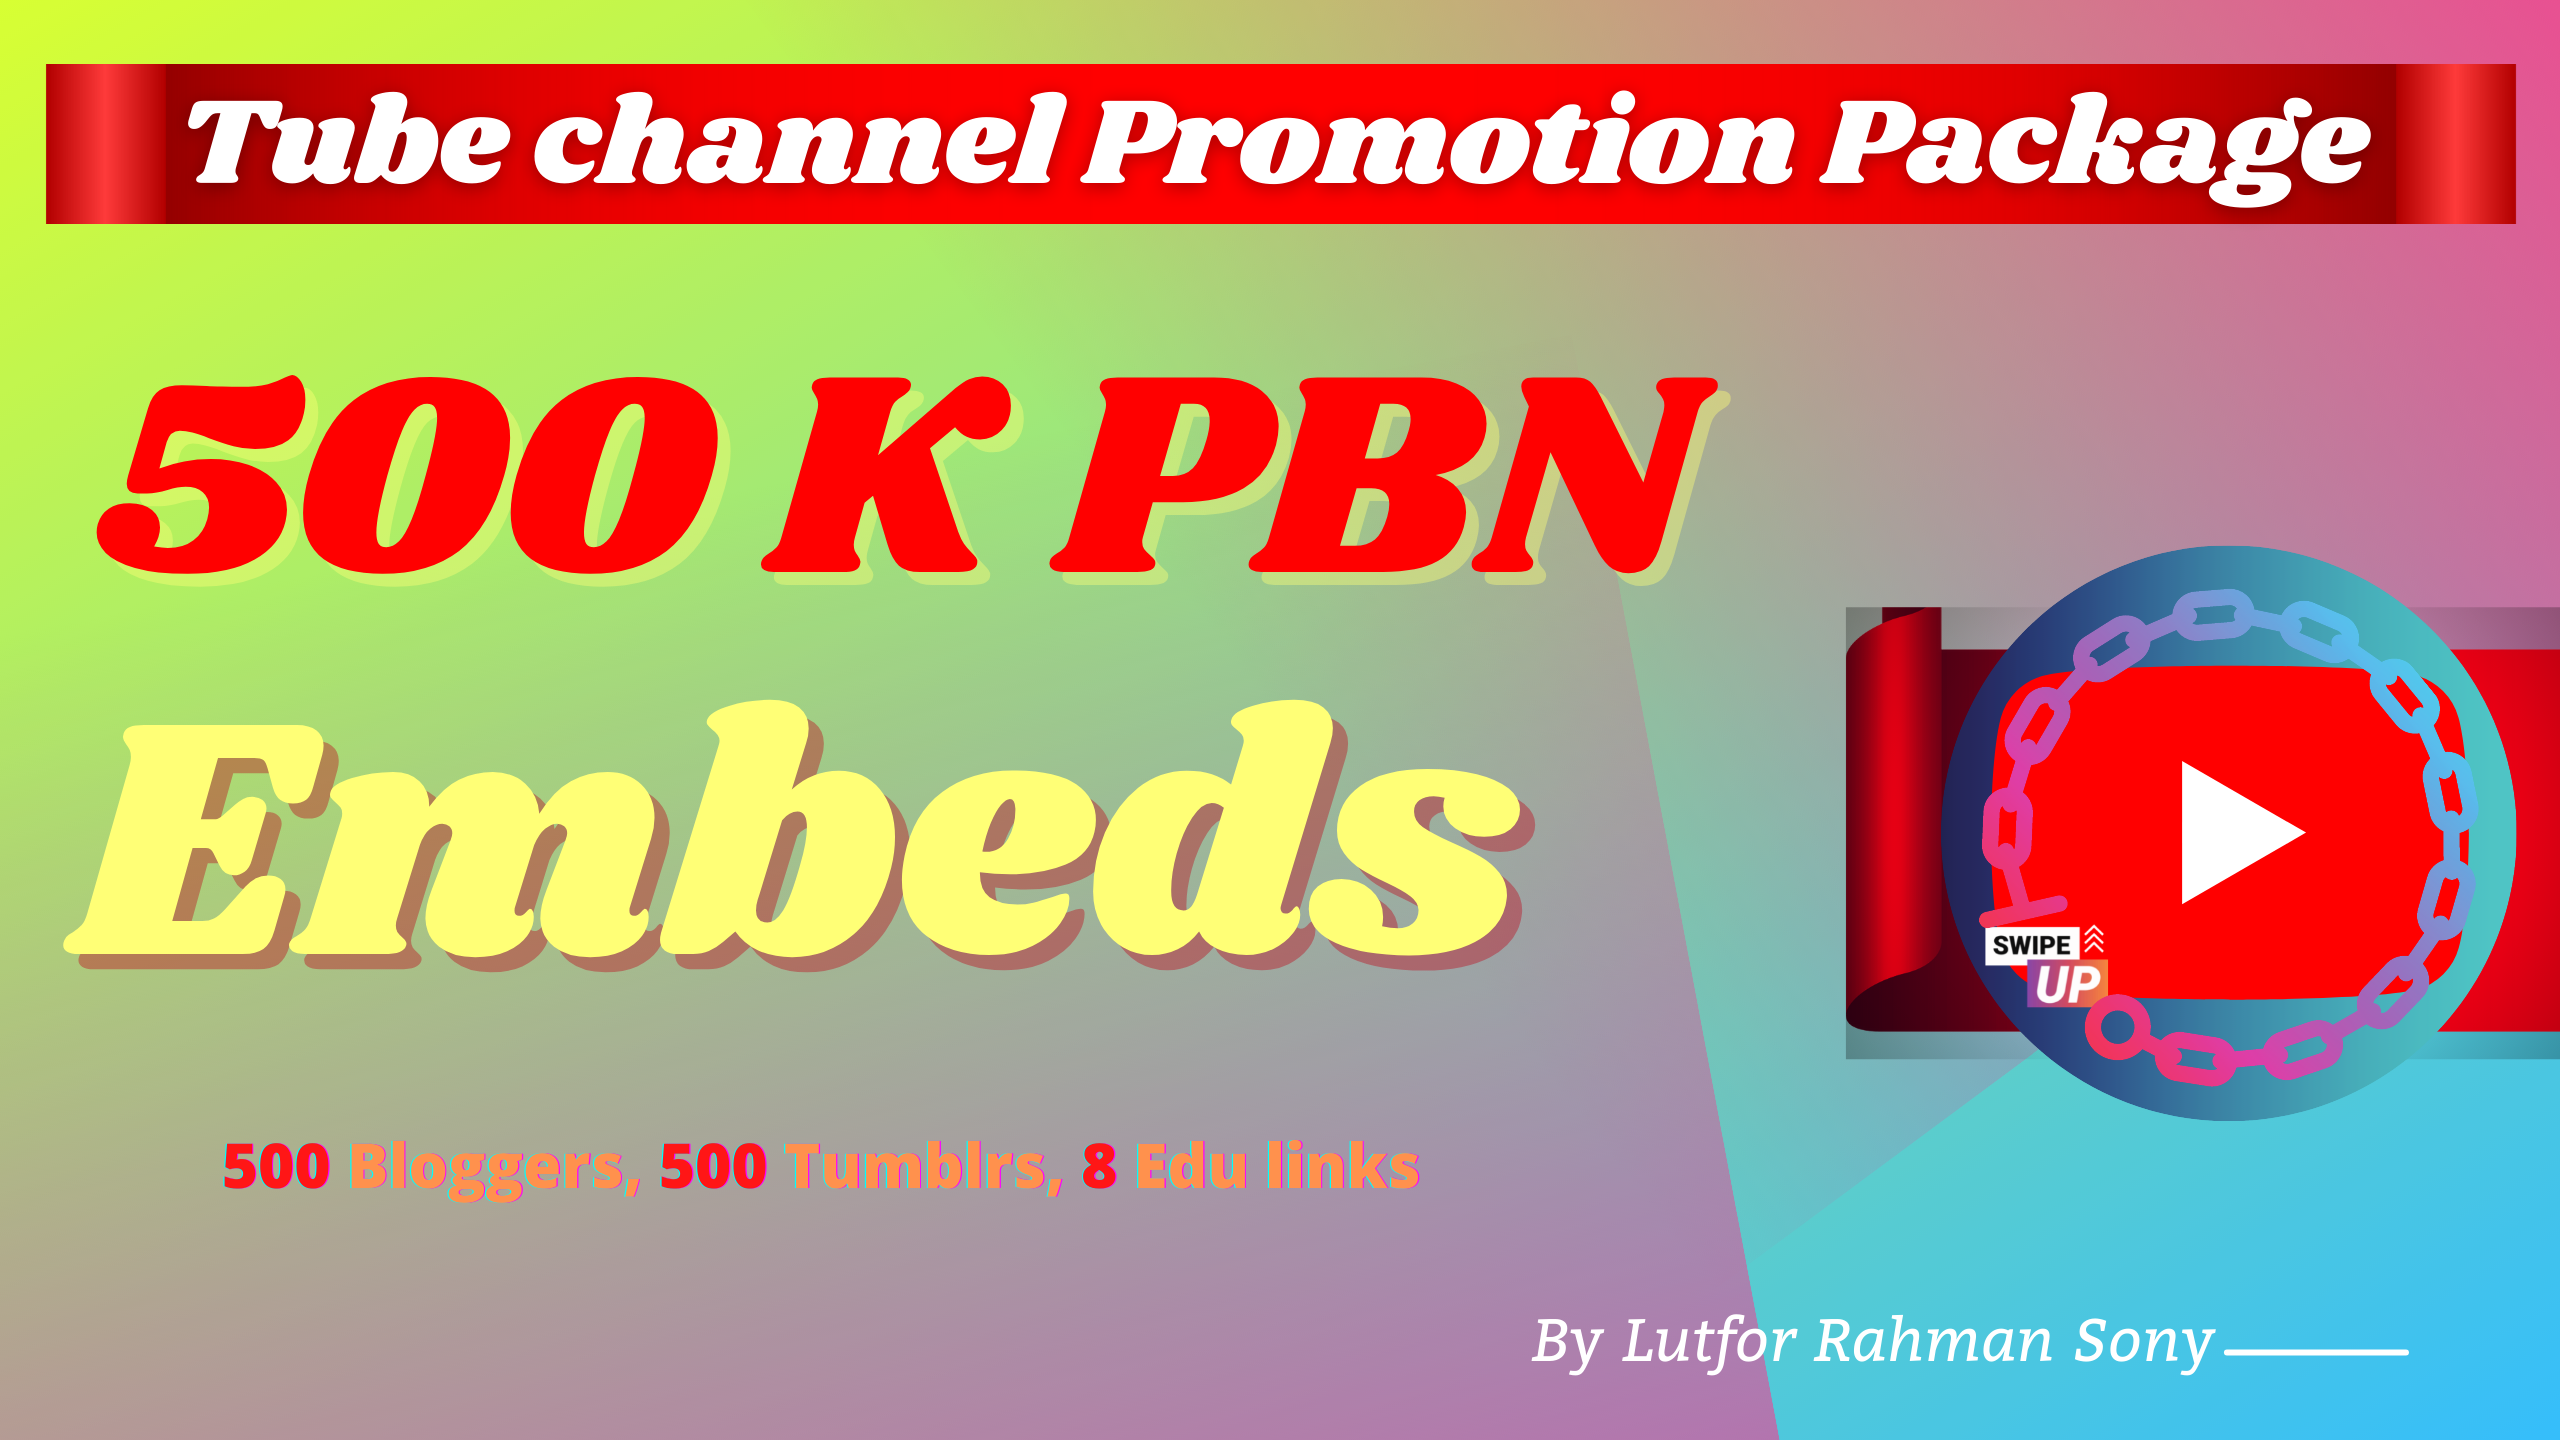 Video Channel Marketing - 500K Embeds + 200 Blogger, 200 Tumblr & EDU backlinks